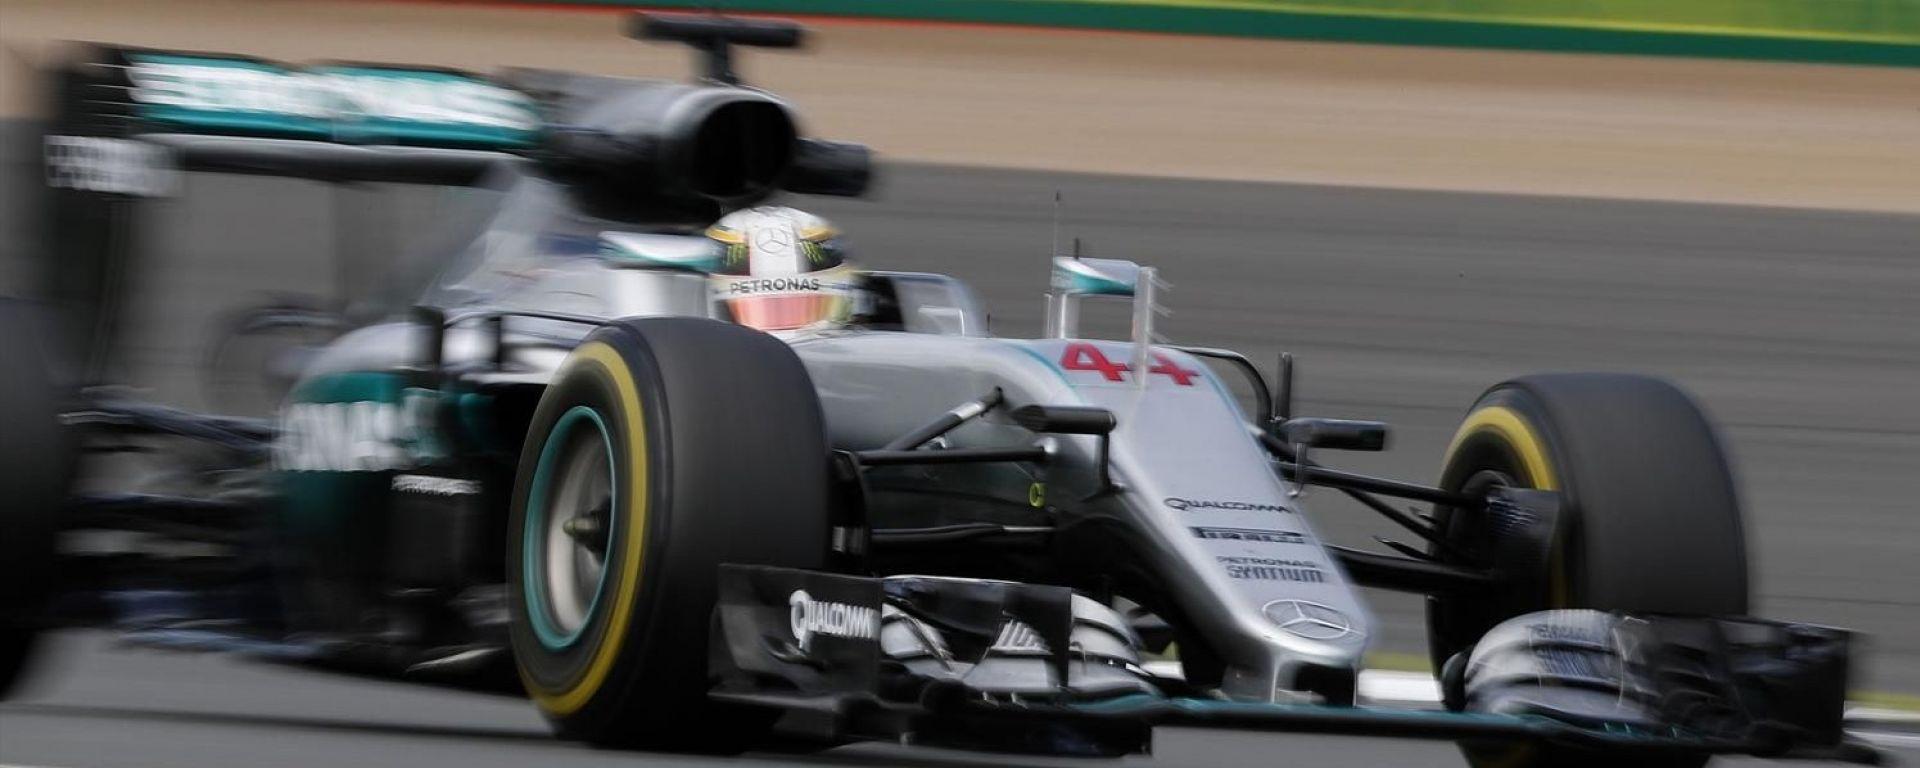 Gran Premio d'Inghilterra